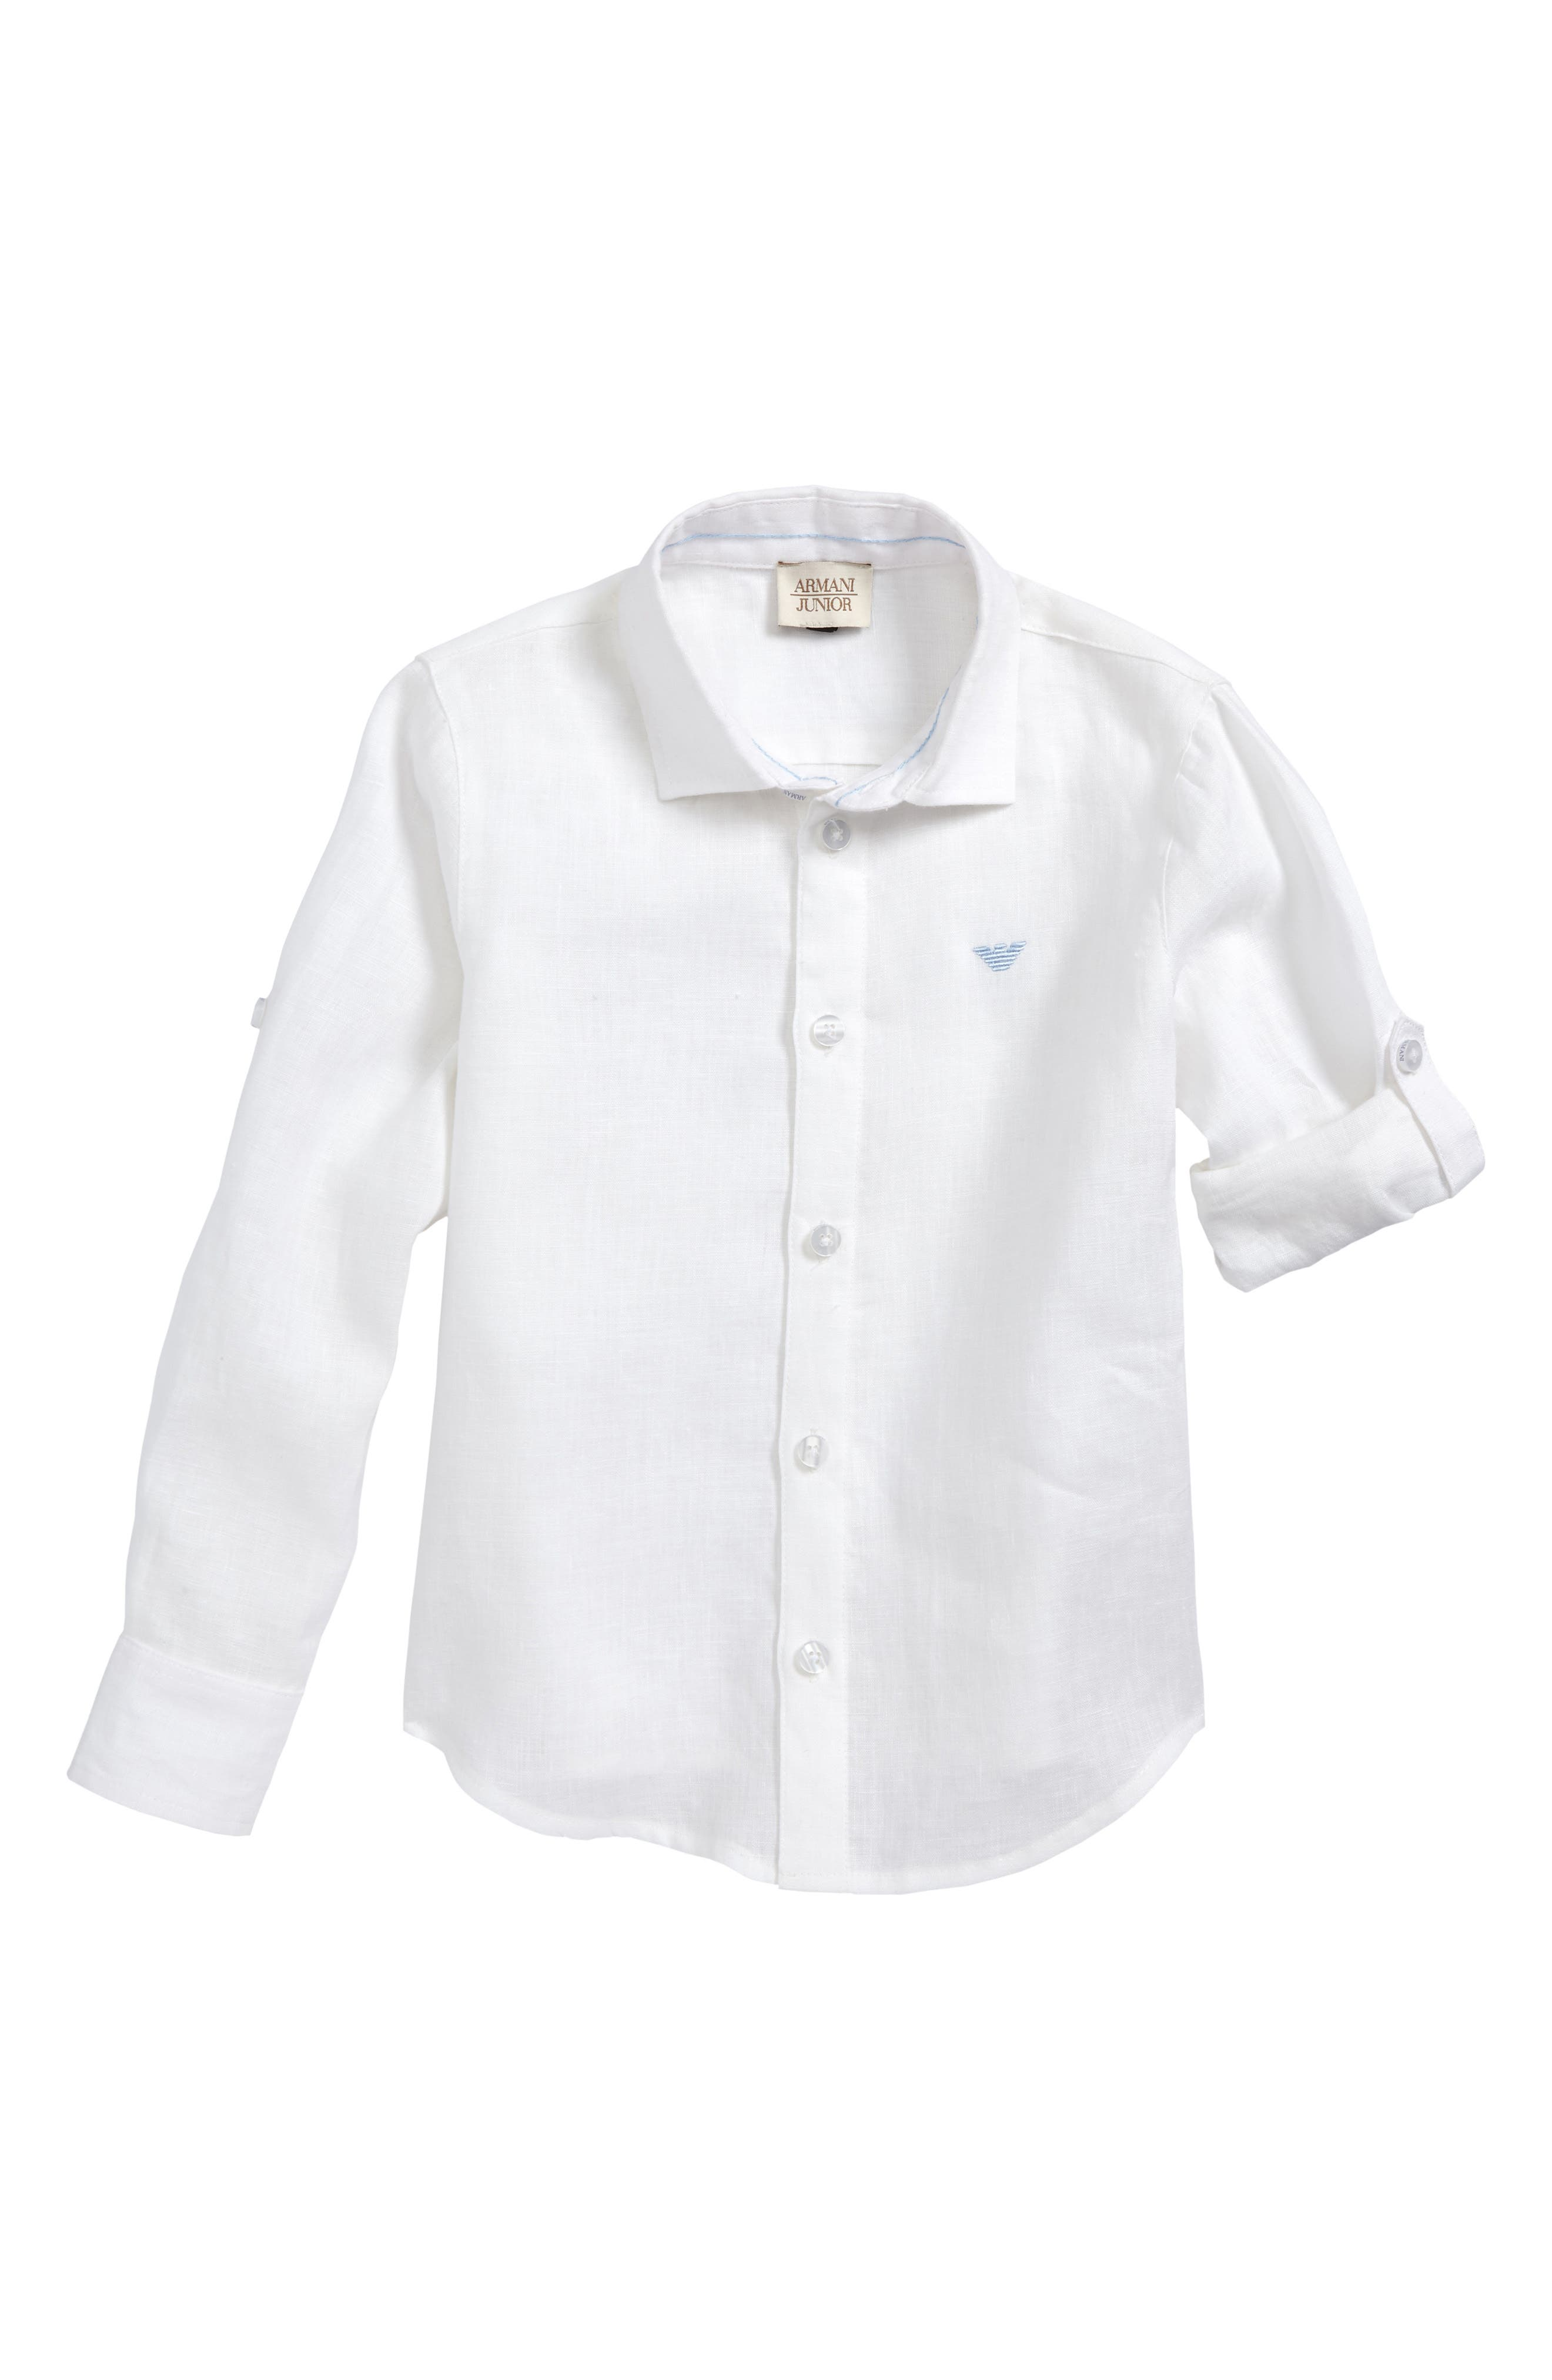 Linen Shirt,                             Main thumbnail 1, color,                             White